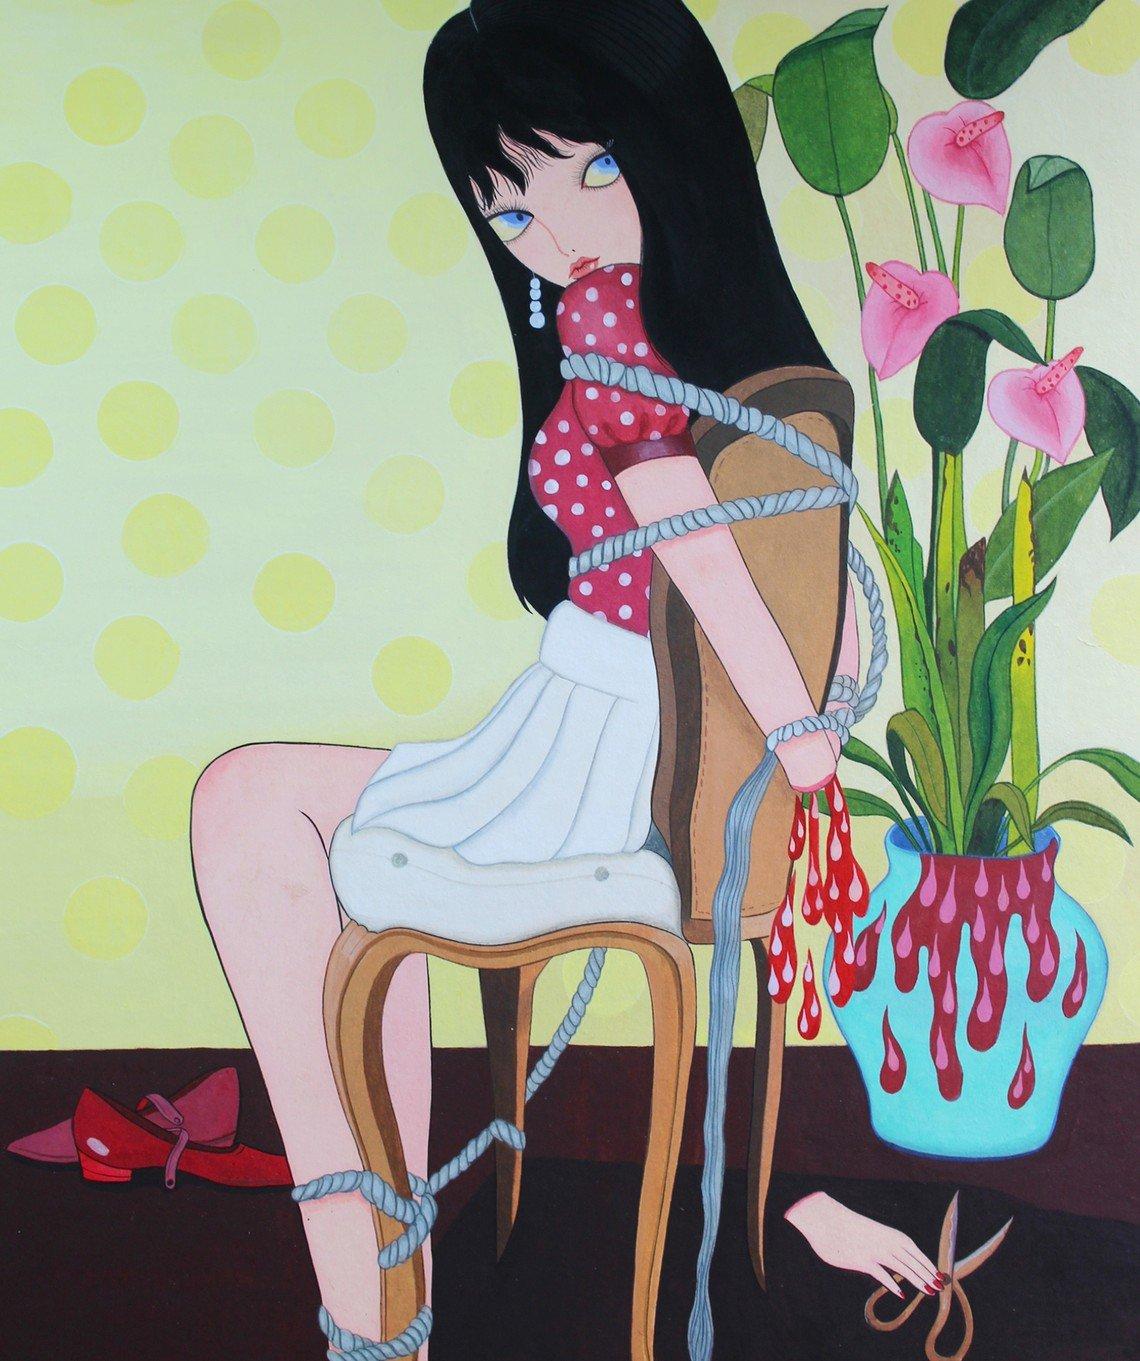 Jang Koal - Red Shoes Girl